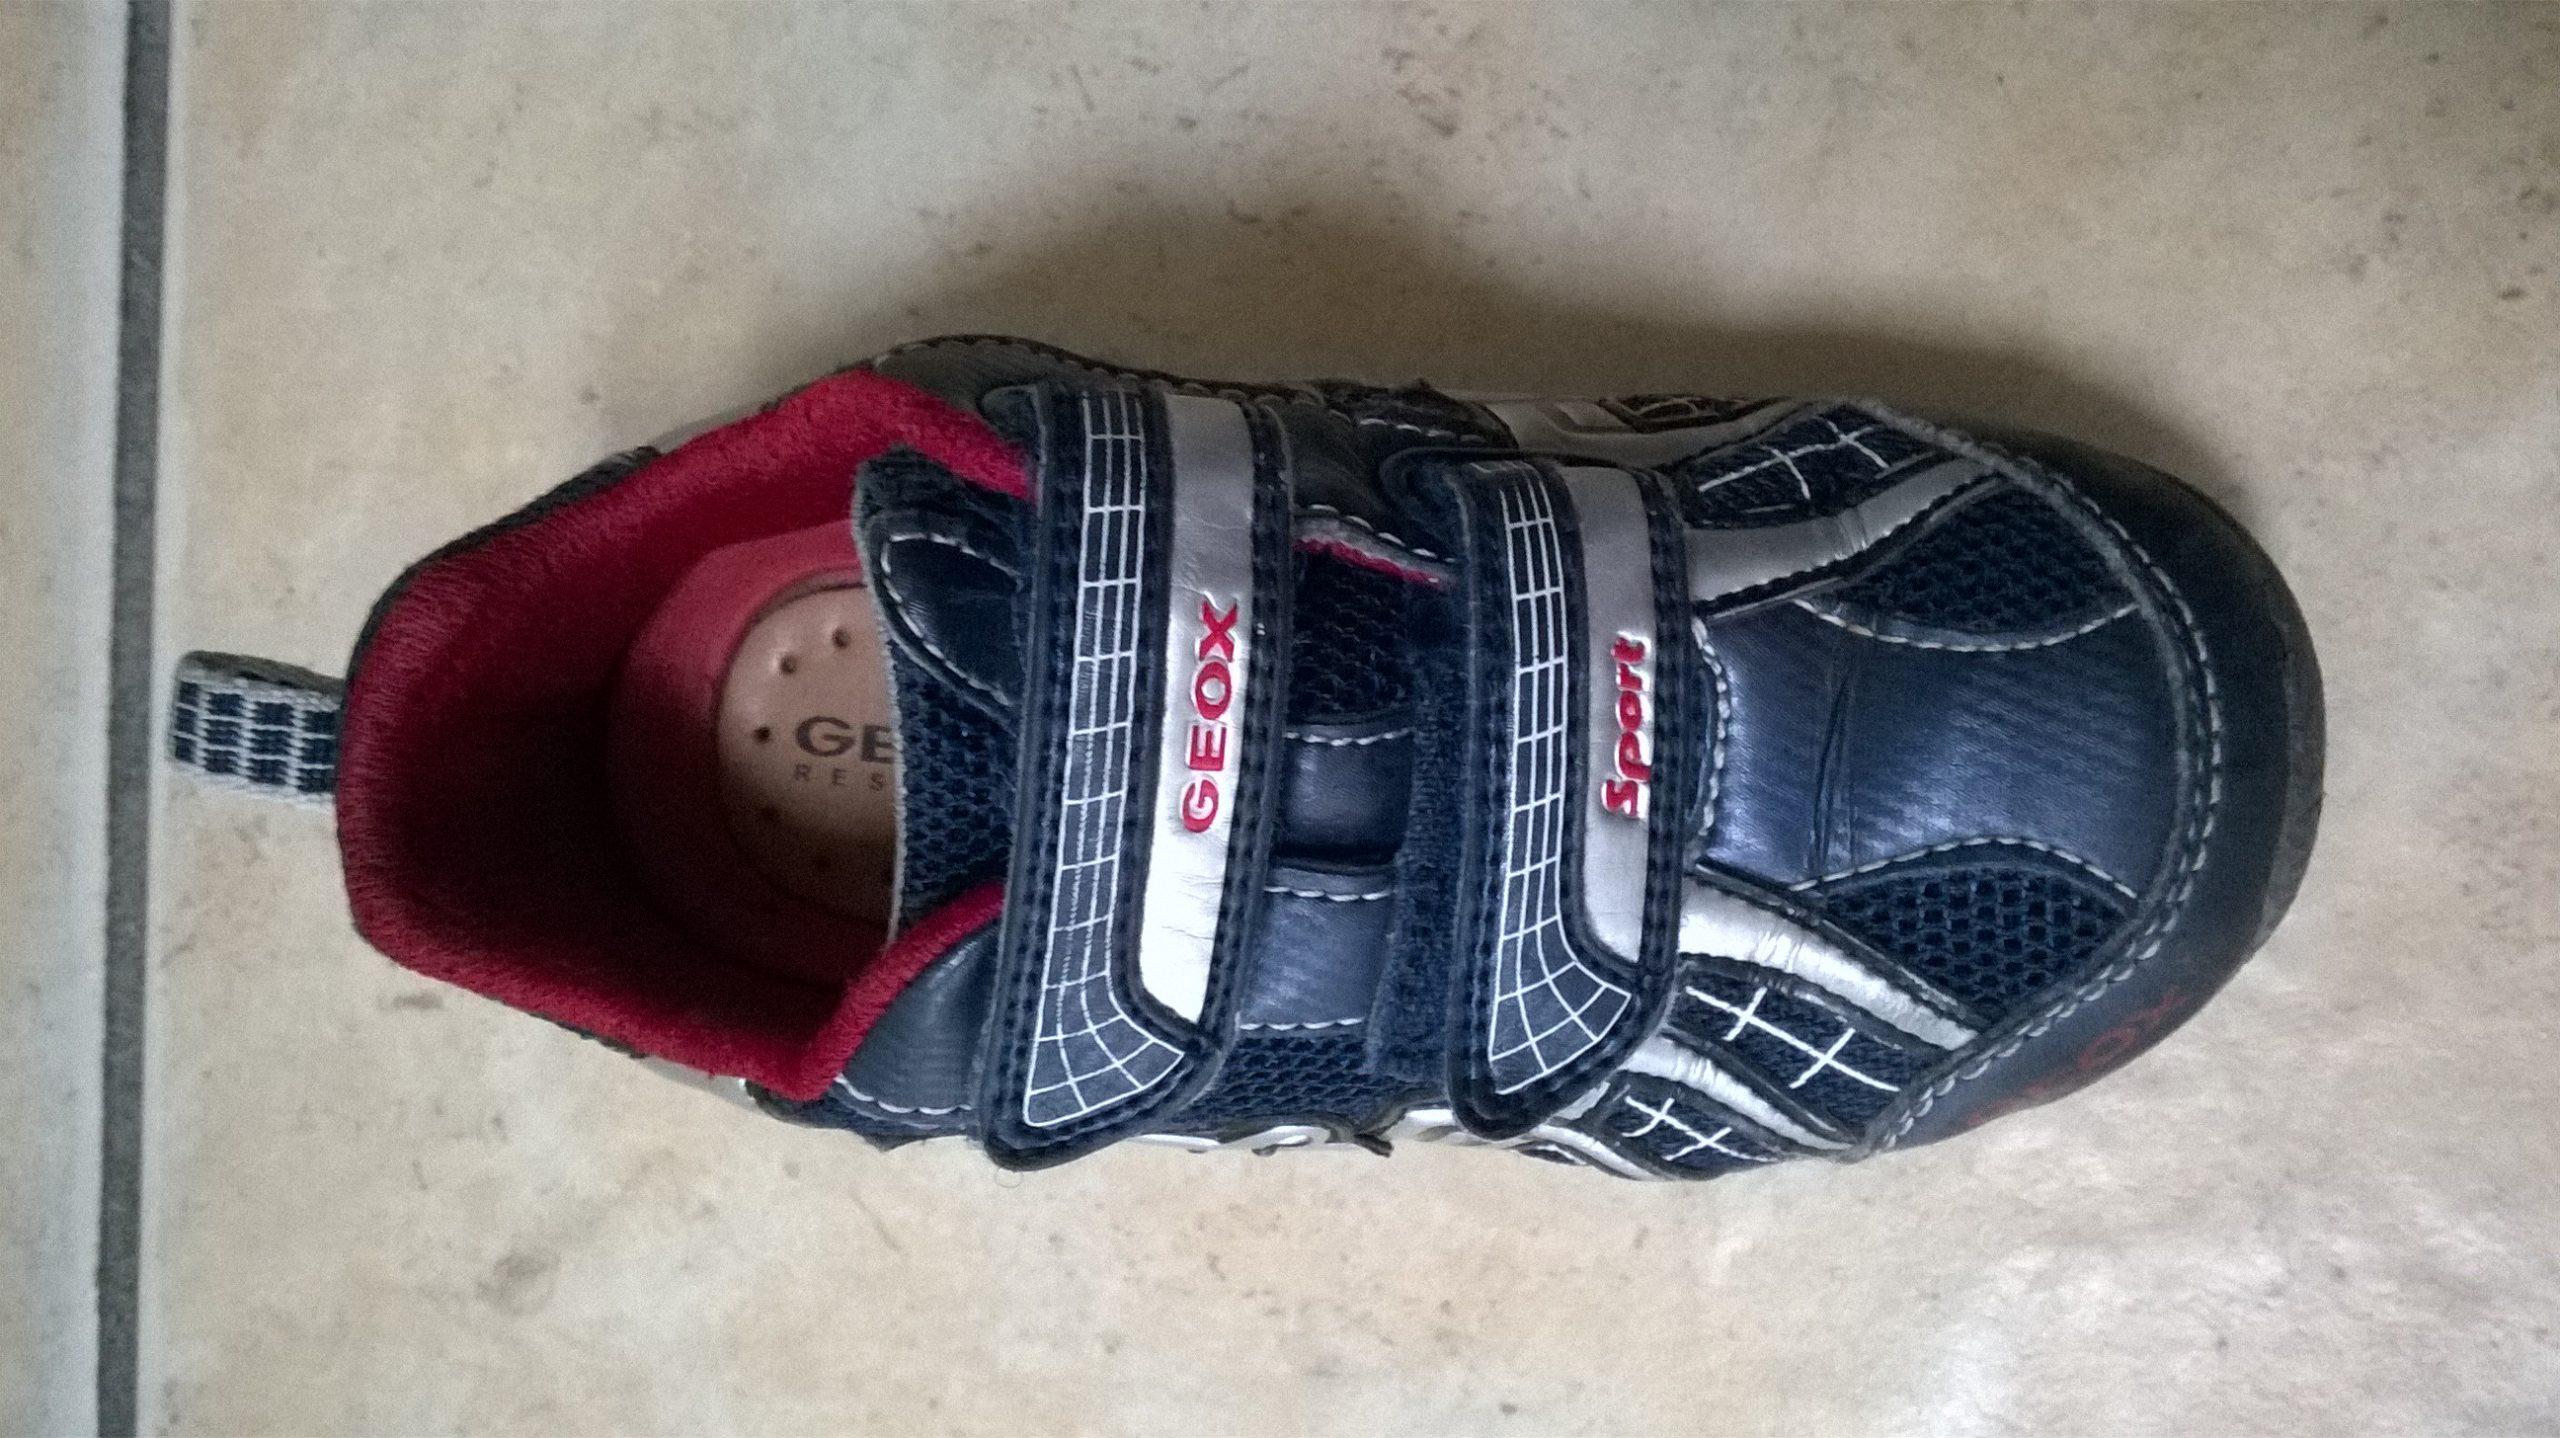 Found: Geox child's shoe